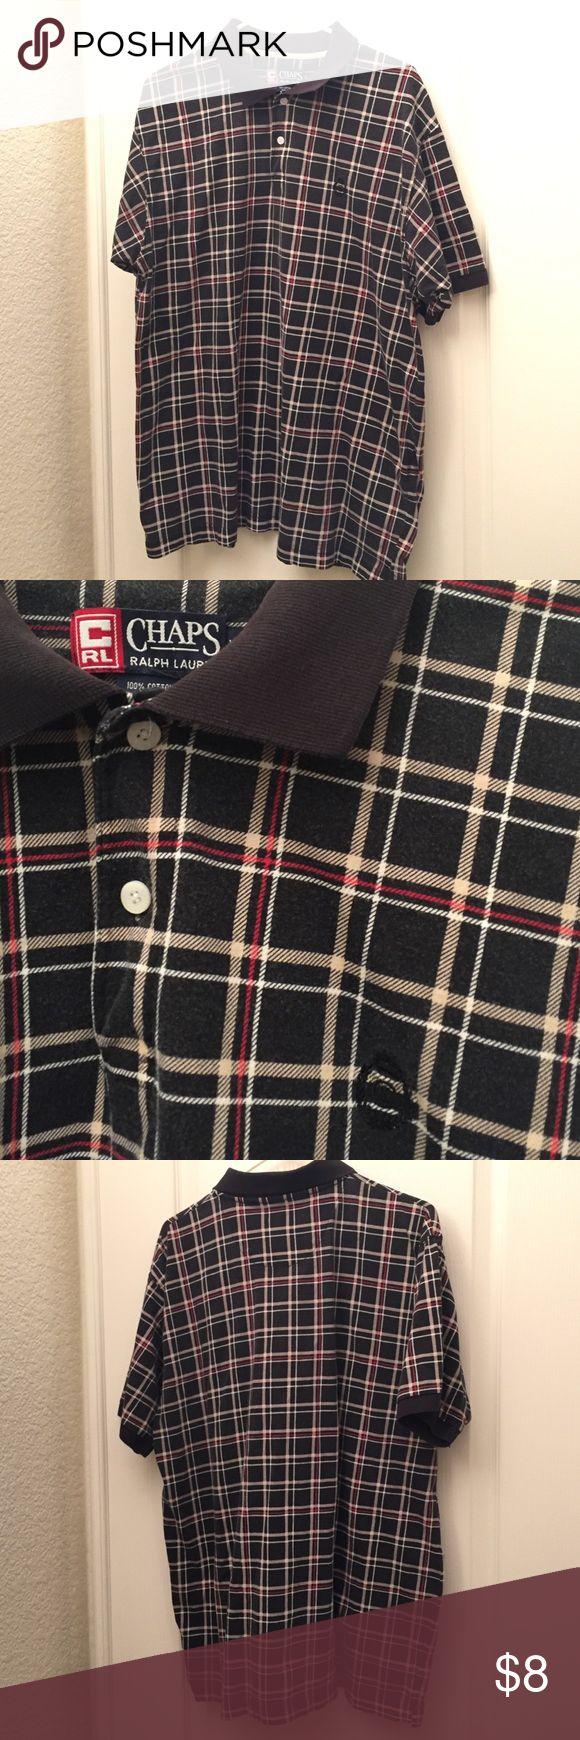 Men's Chaps Ralph Lauren Polo Faded black plaid polo shirt {2} Chaps Shirts Polos